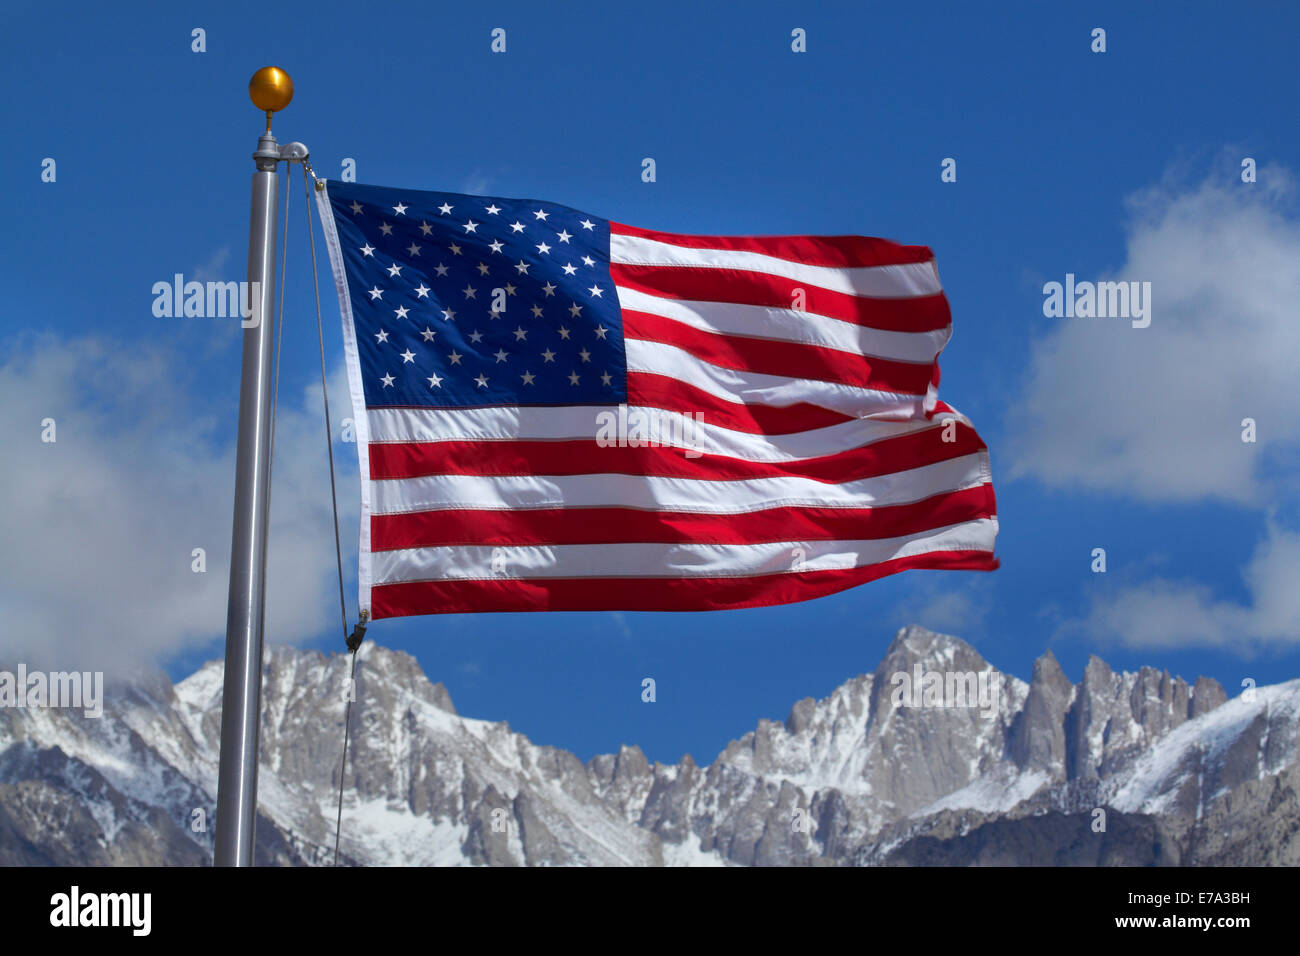 American flag and snow on Sierra Nevada Mountain Range, California, USA - Stock Image